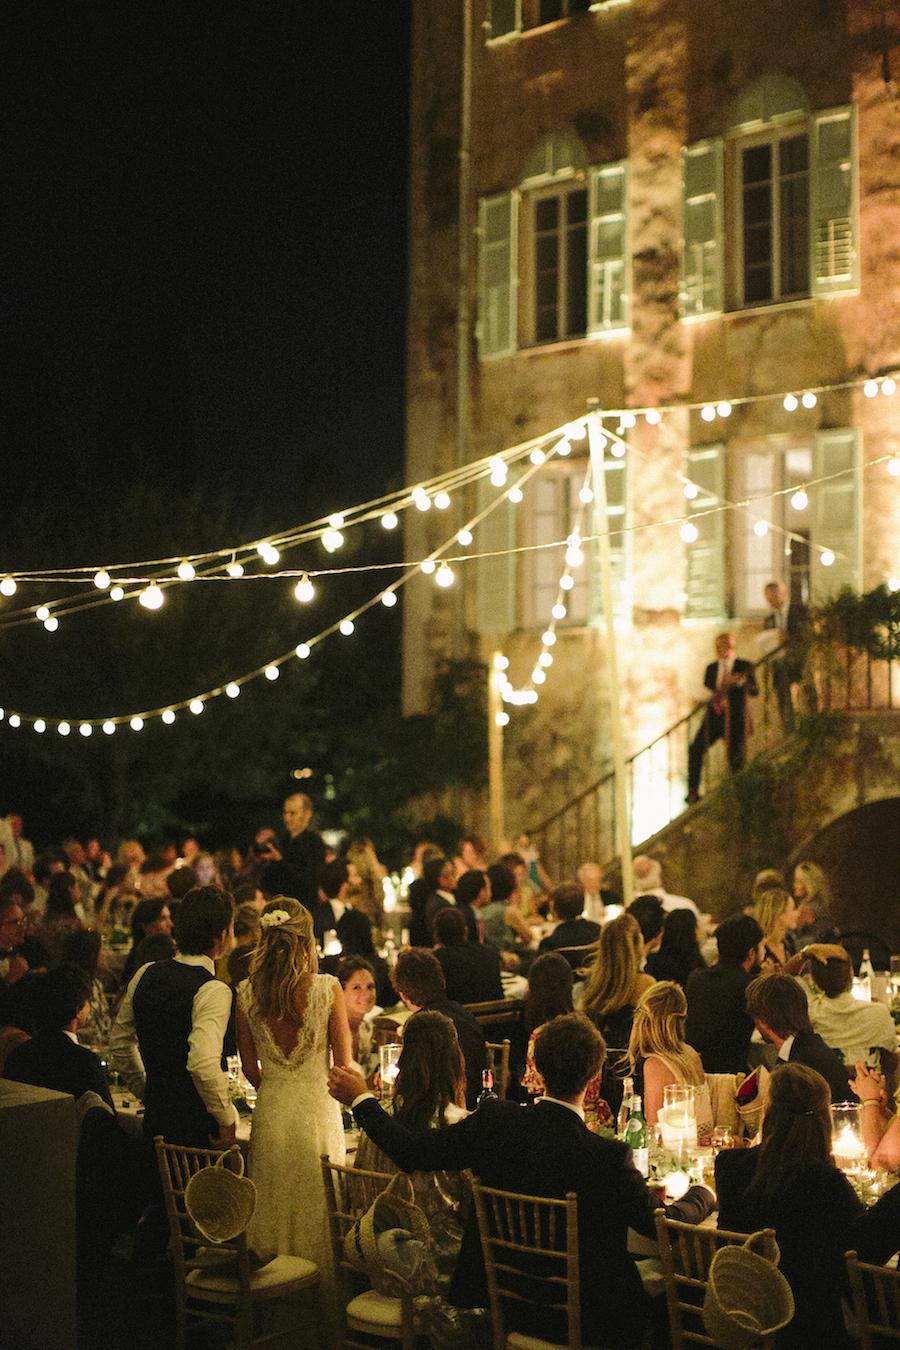 saya-photography-wedding-french-riviera-rustic-antibes-la-bastide-du-roy-132.jpg